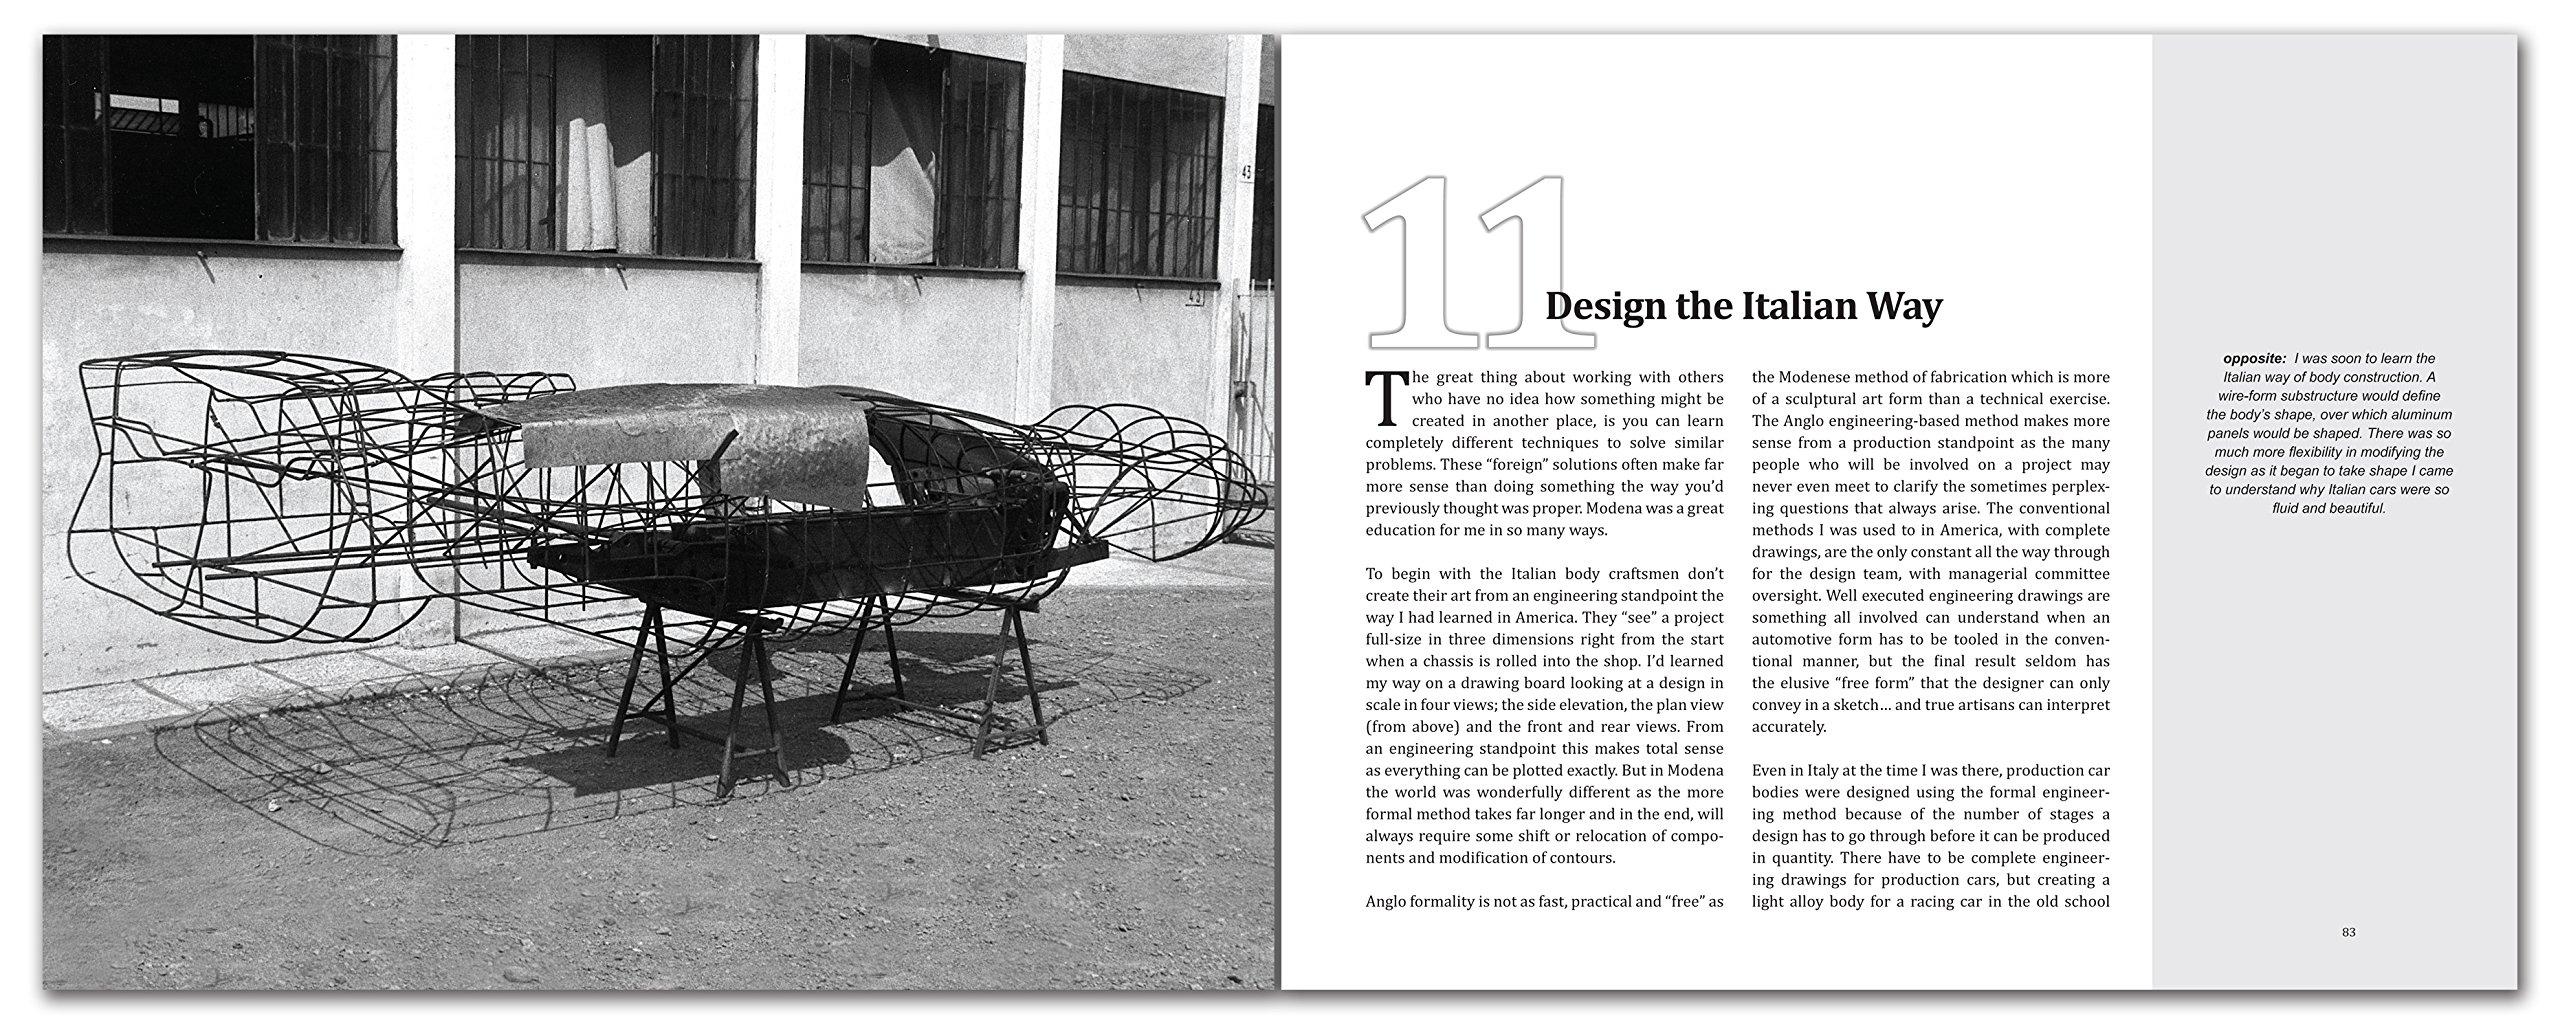 Road to Modena: Origins & History of the Shelby - De Tomaso P70